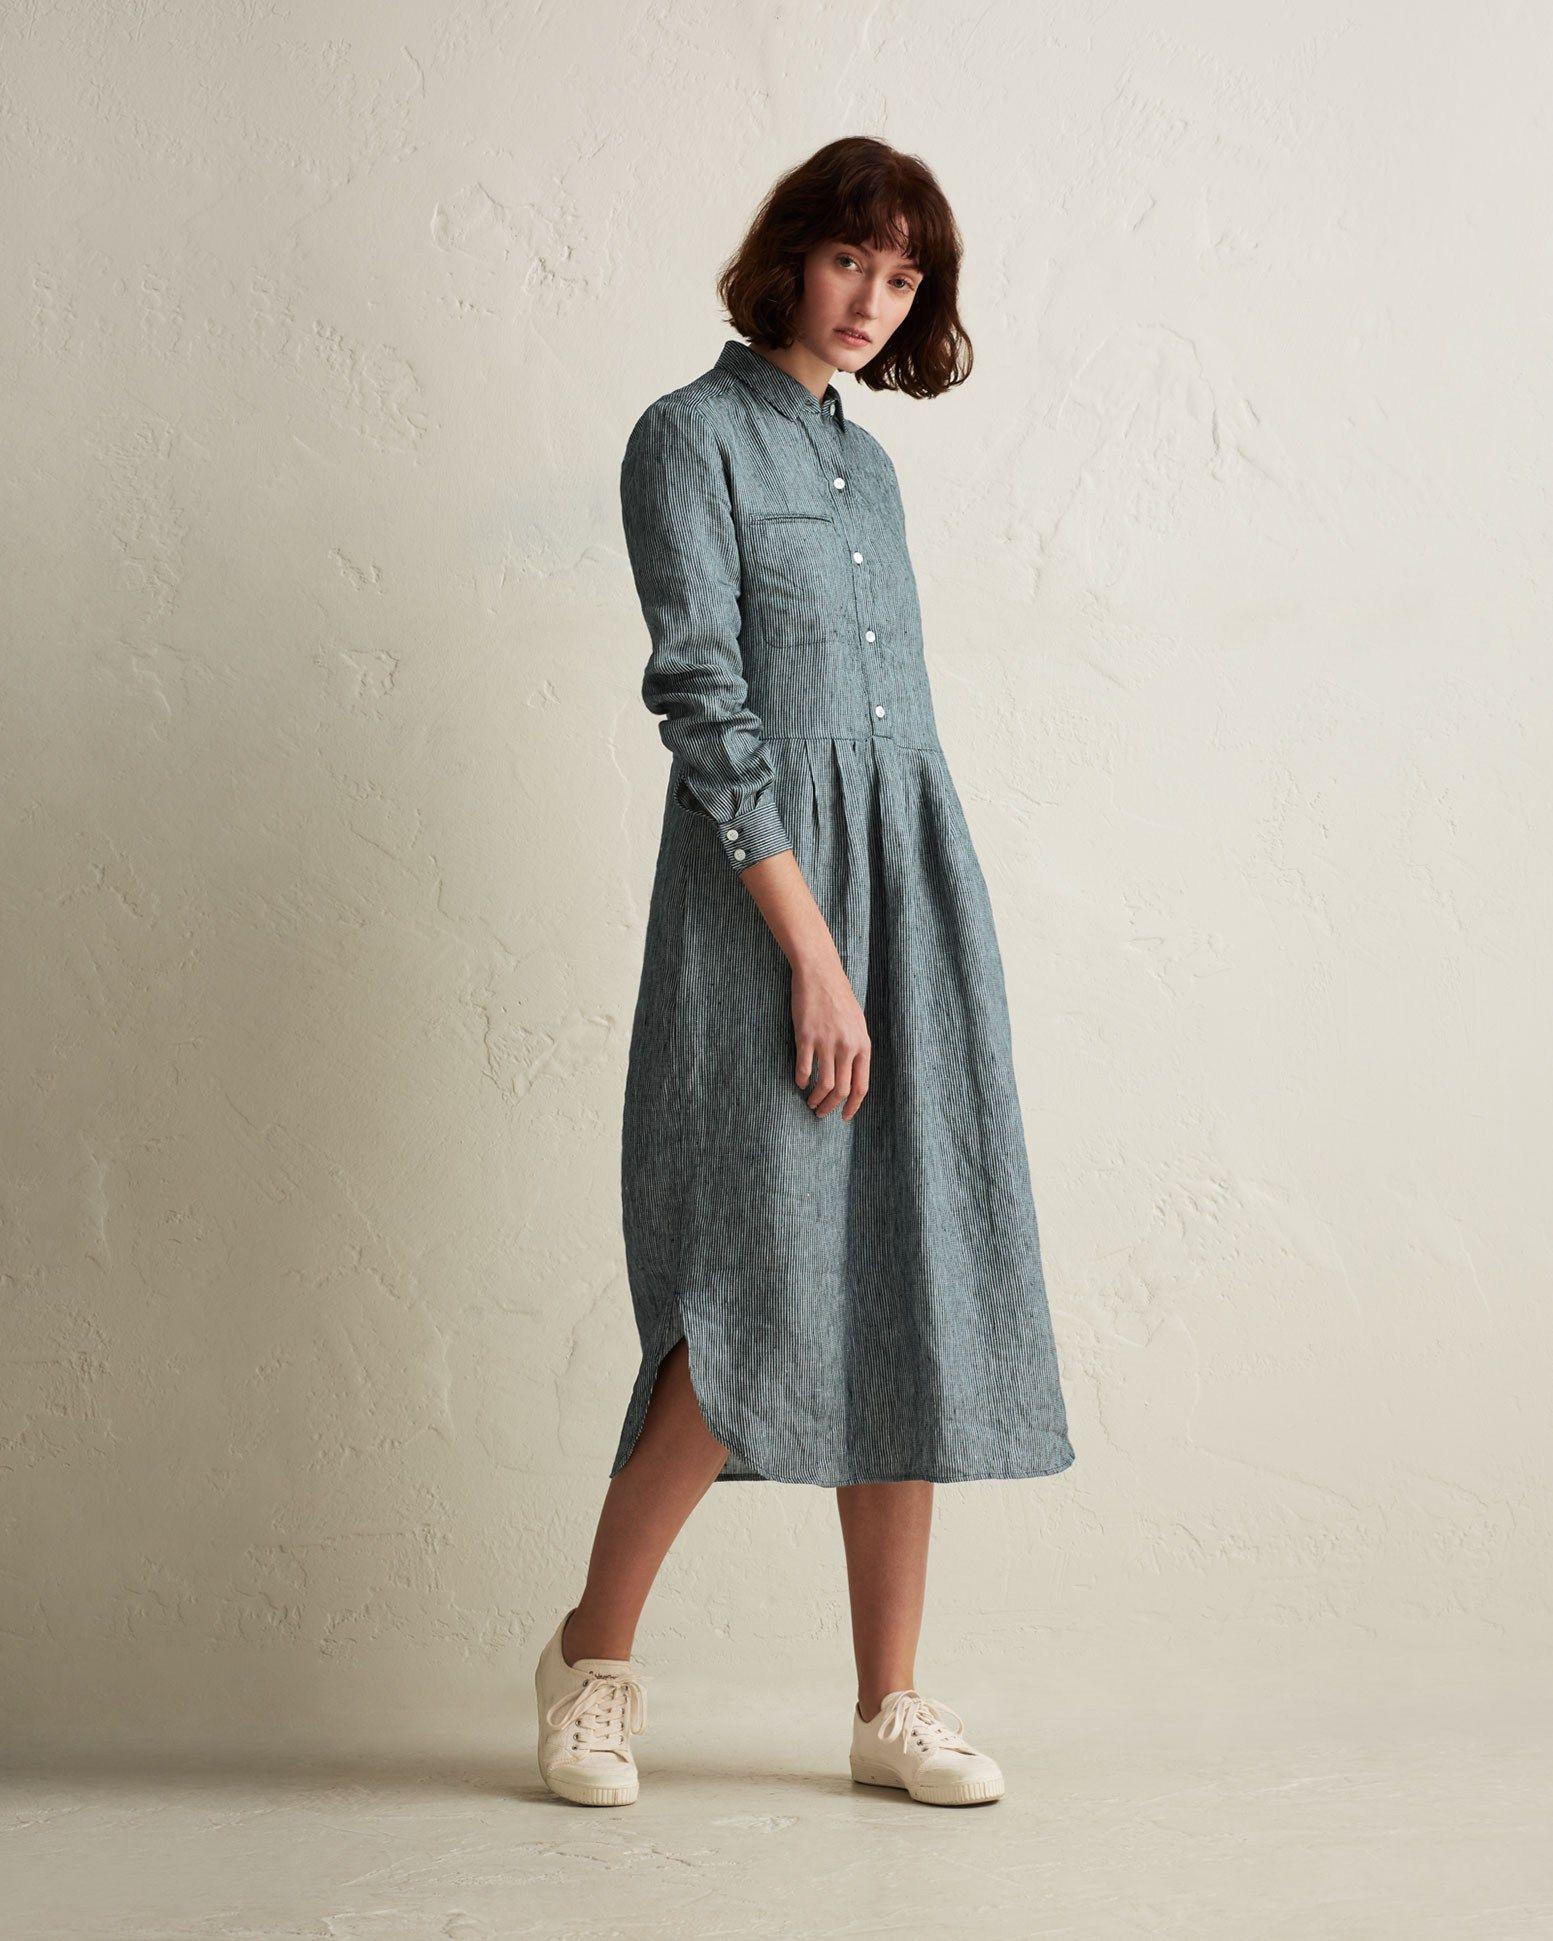 5b62b9ff17dea Shirt dress in a supple